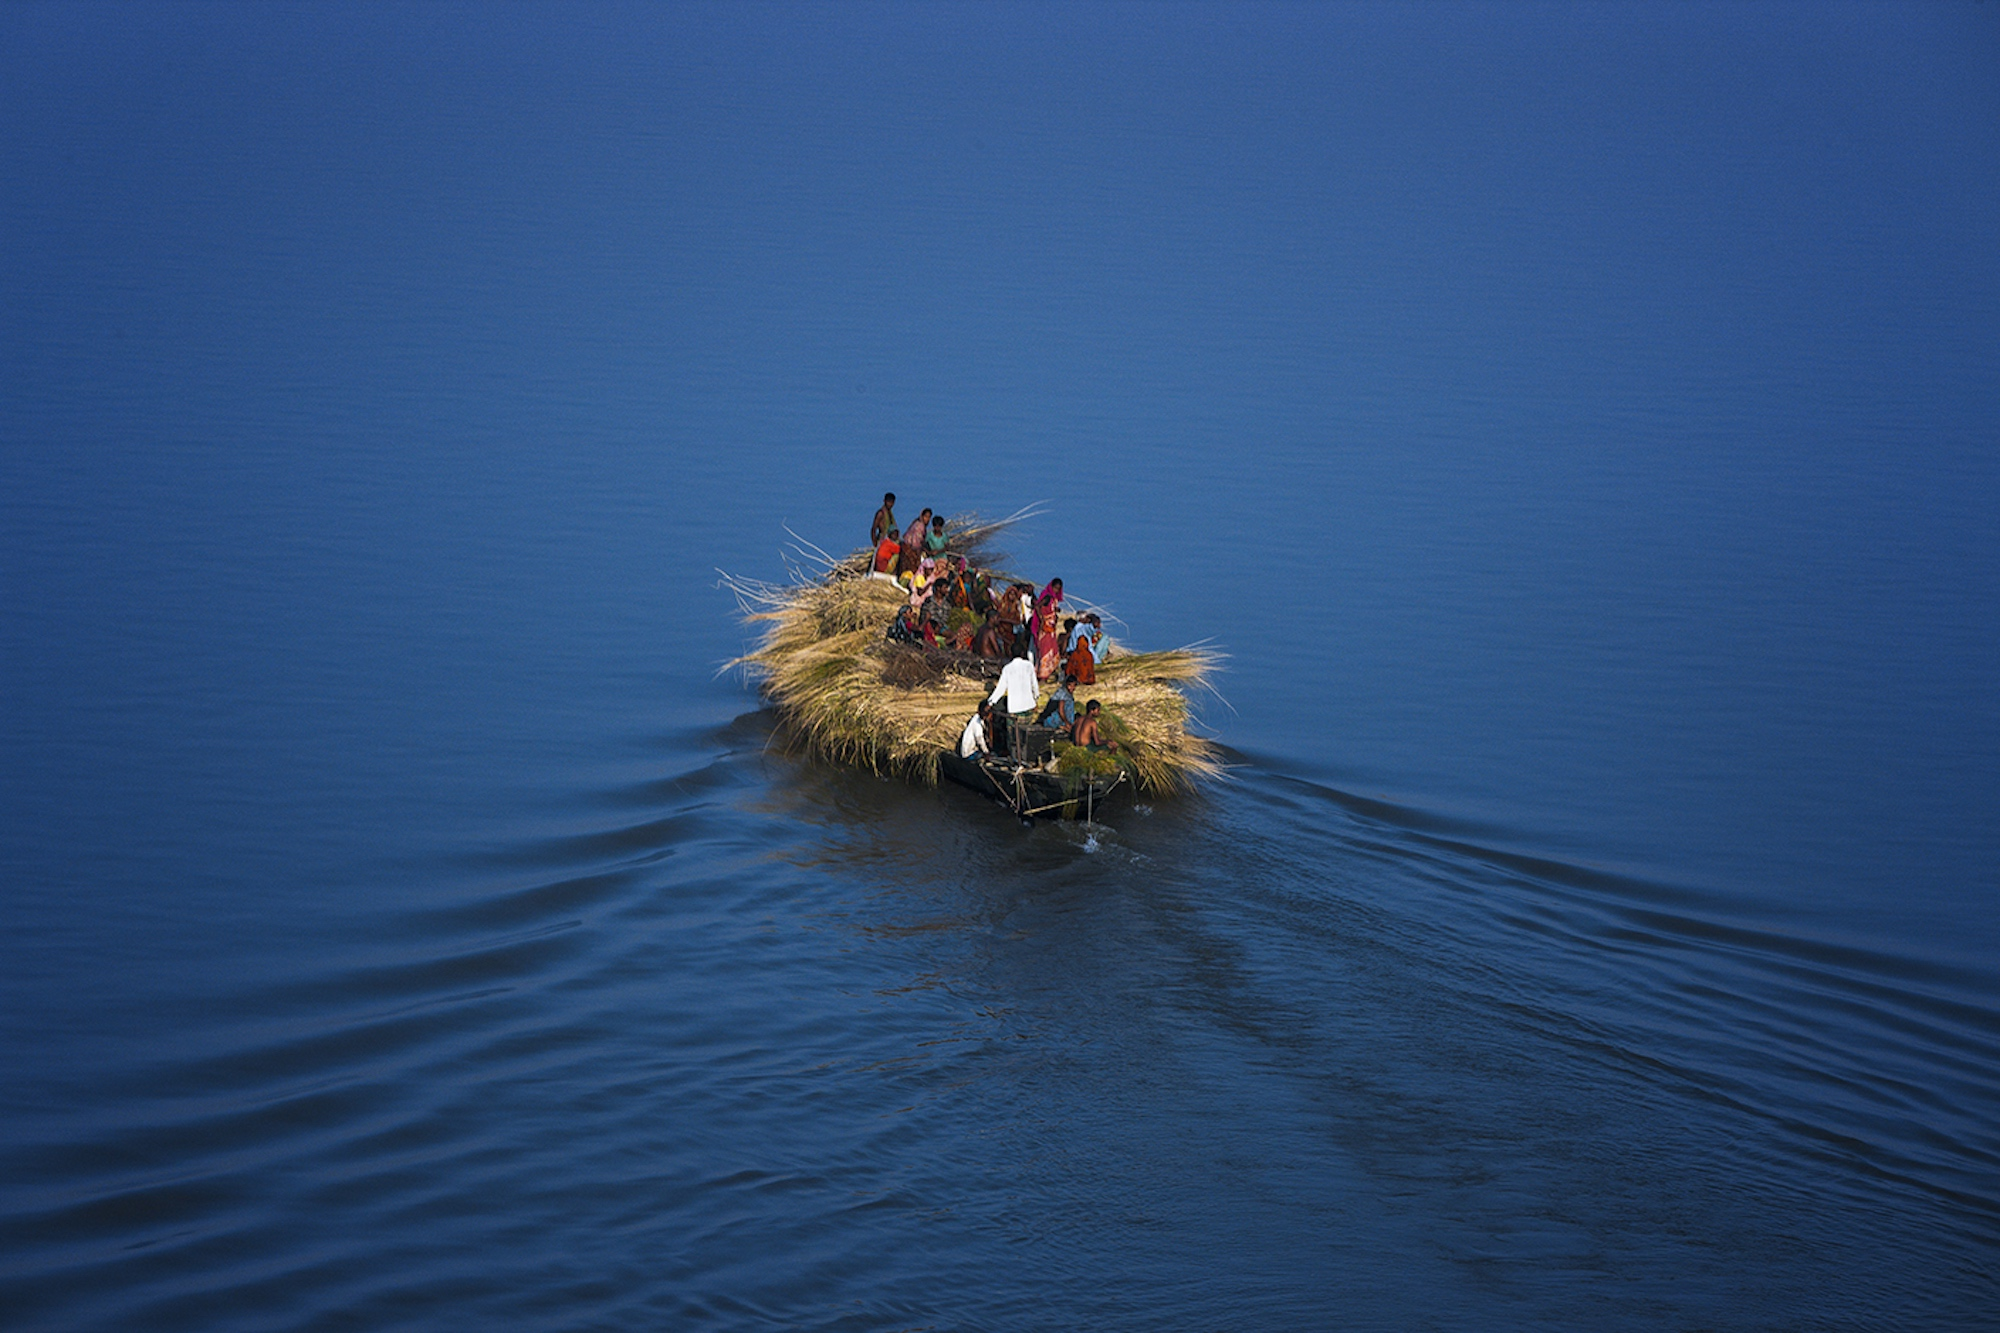 River Jamuna - Yann Arthus-Bertrand